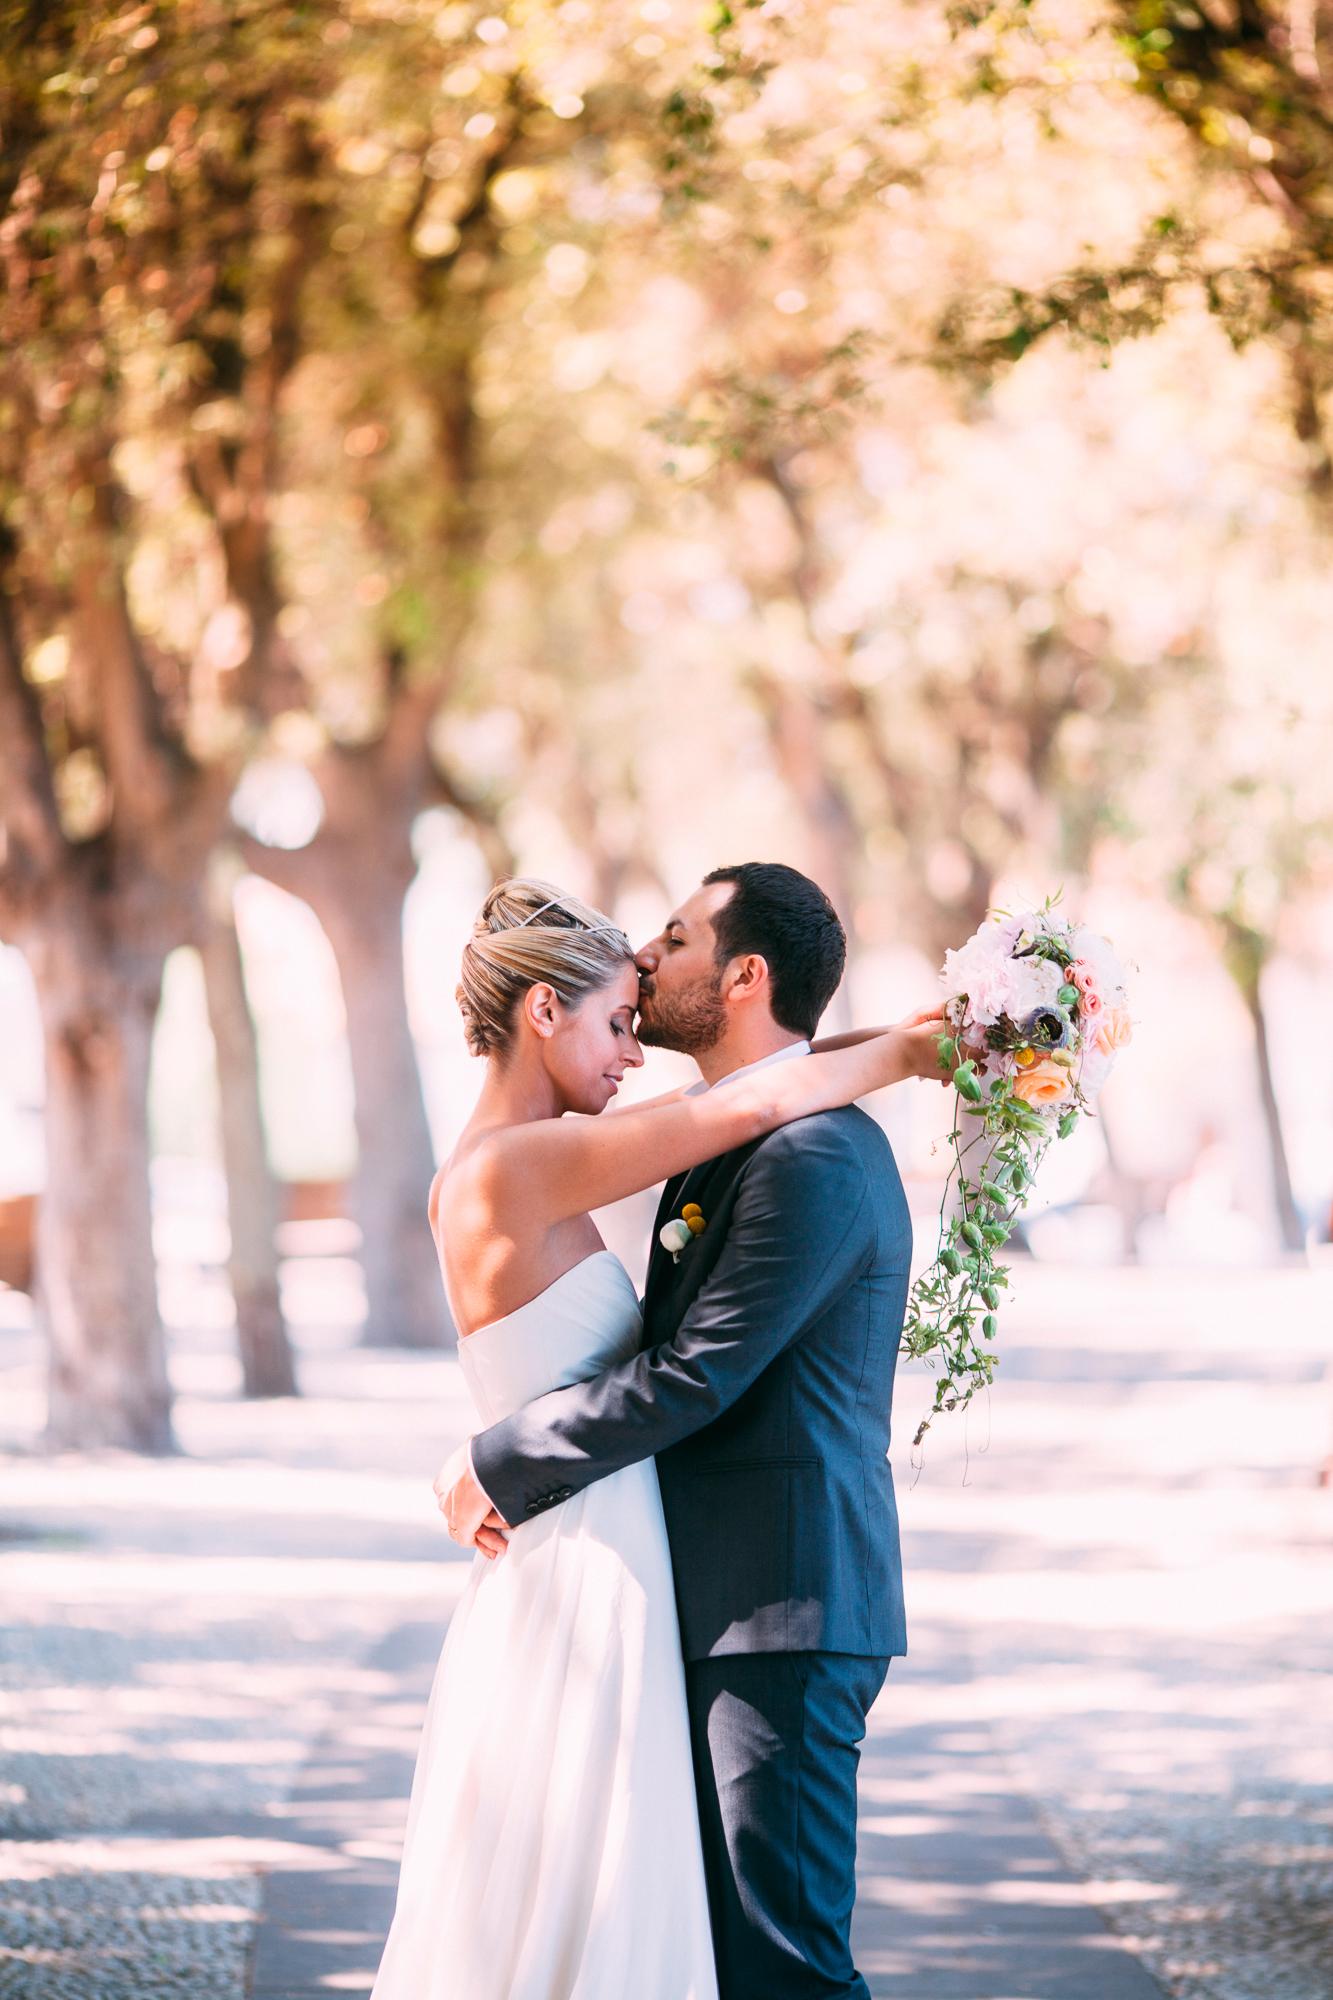 149-bride groom wedding portrait photographer marche conero sirolo. jpg.jpg